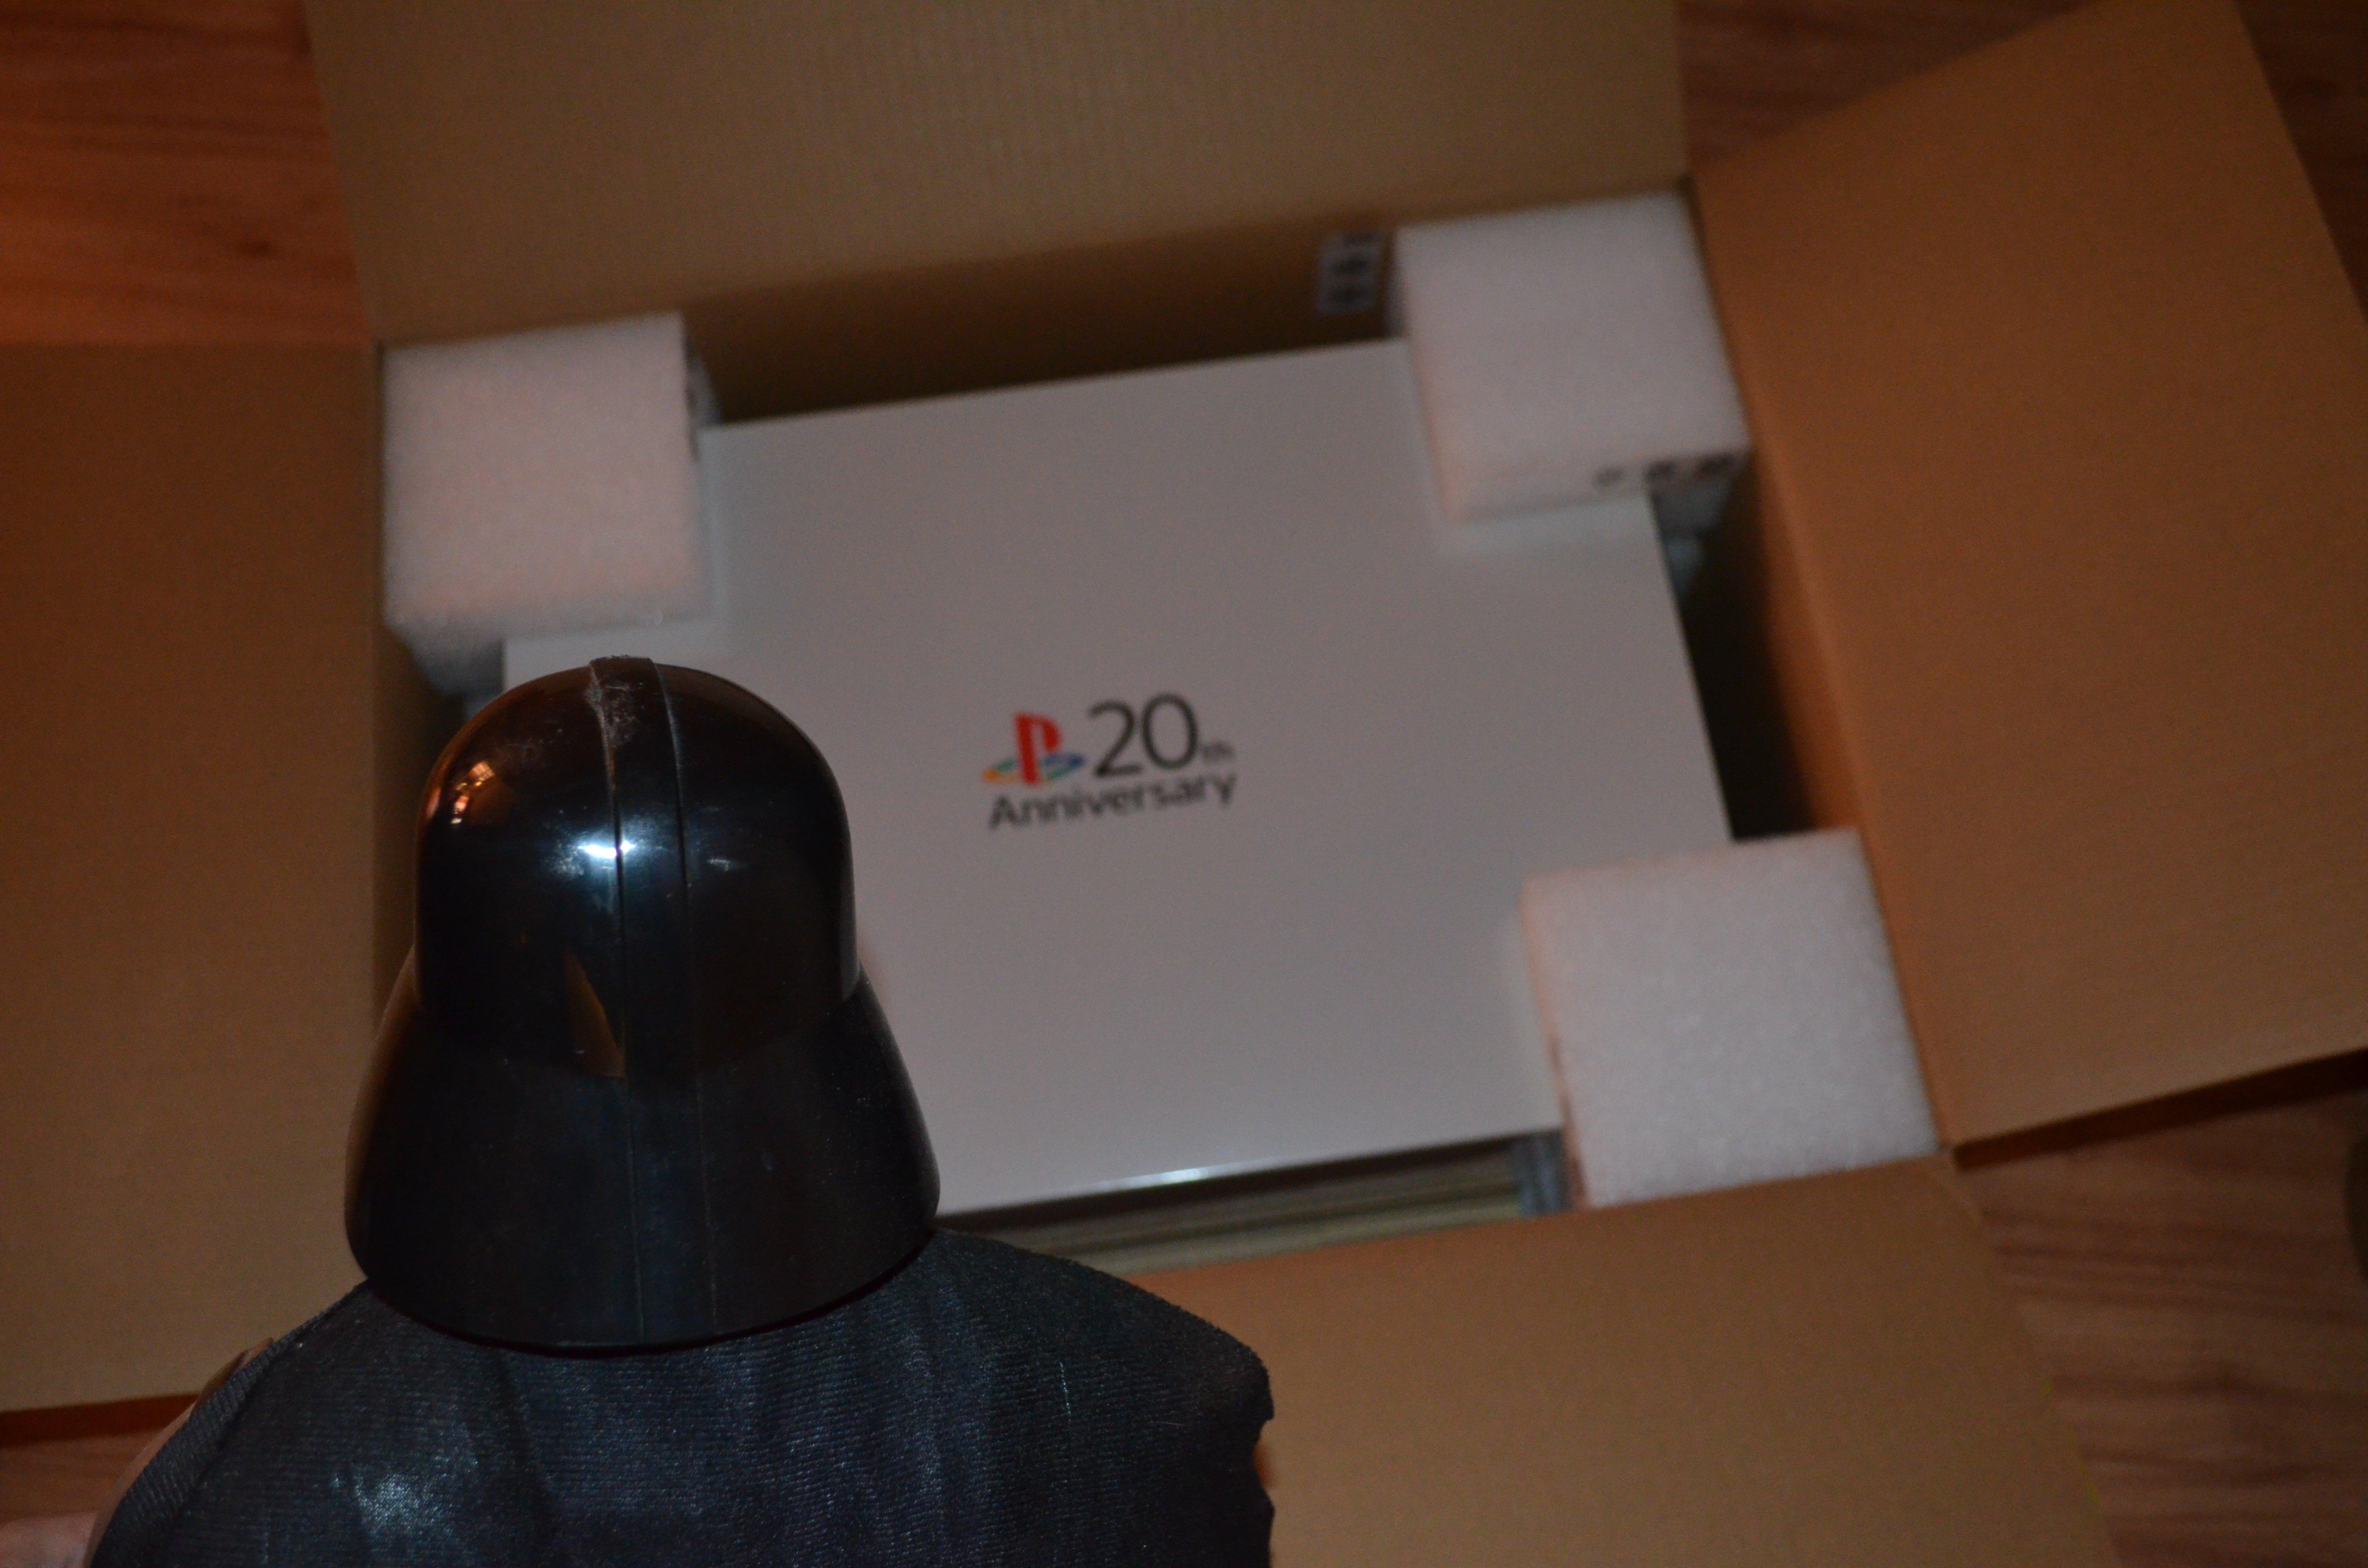 Анбоксинг Имперского издания Playstation 4 Anniversary Edition - Изображение 9